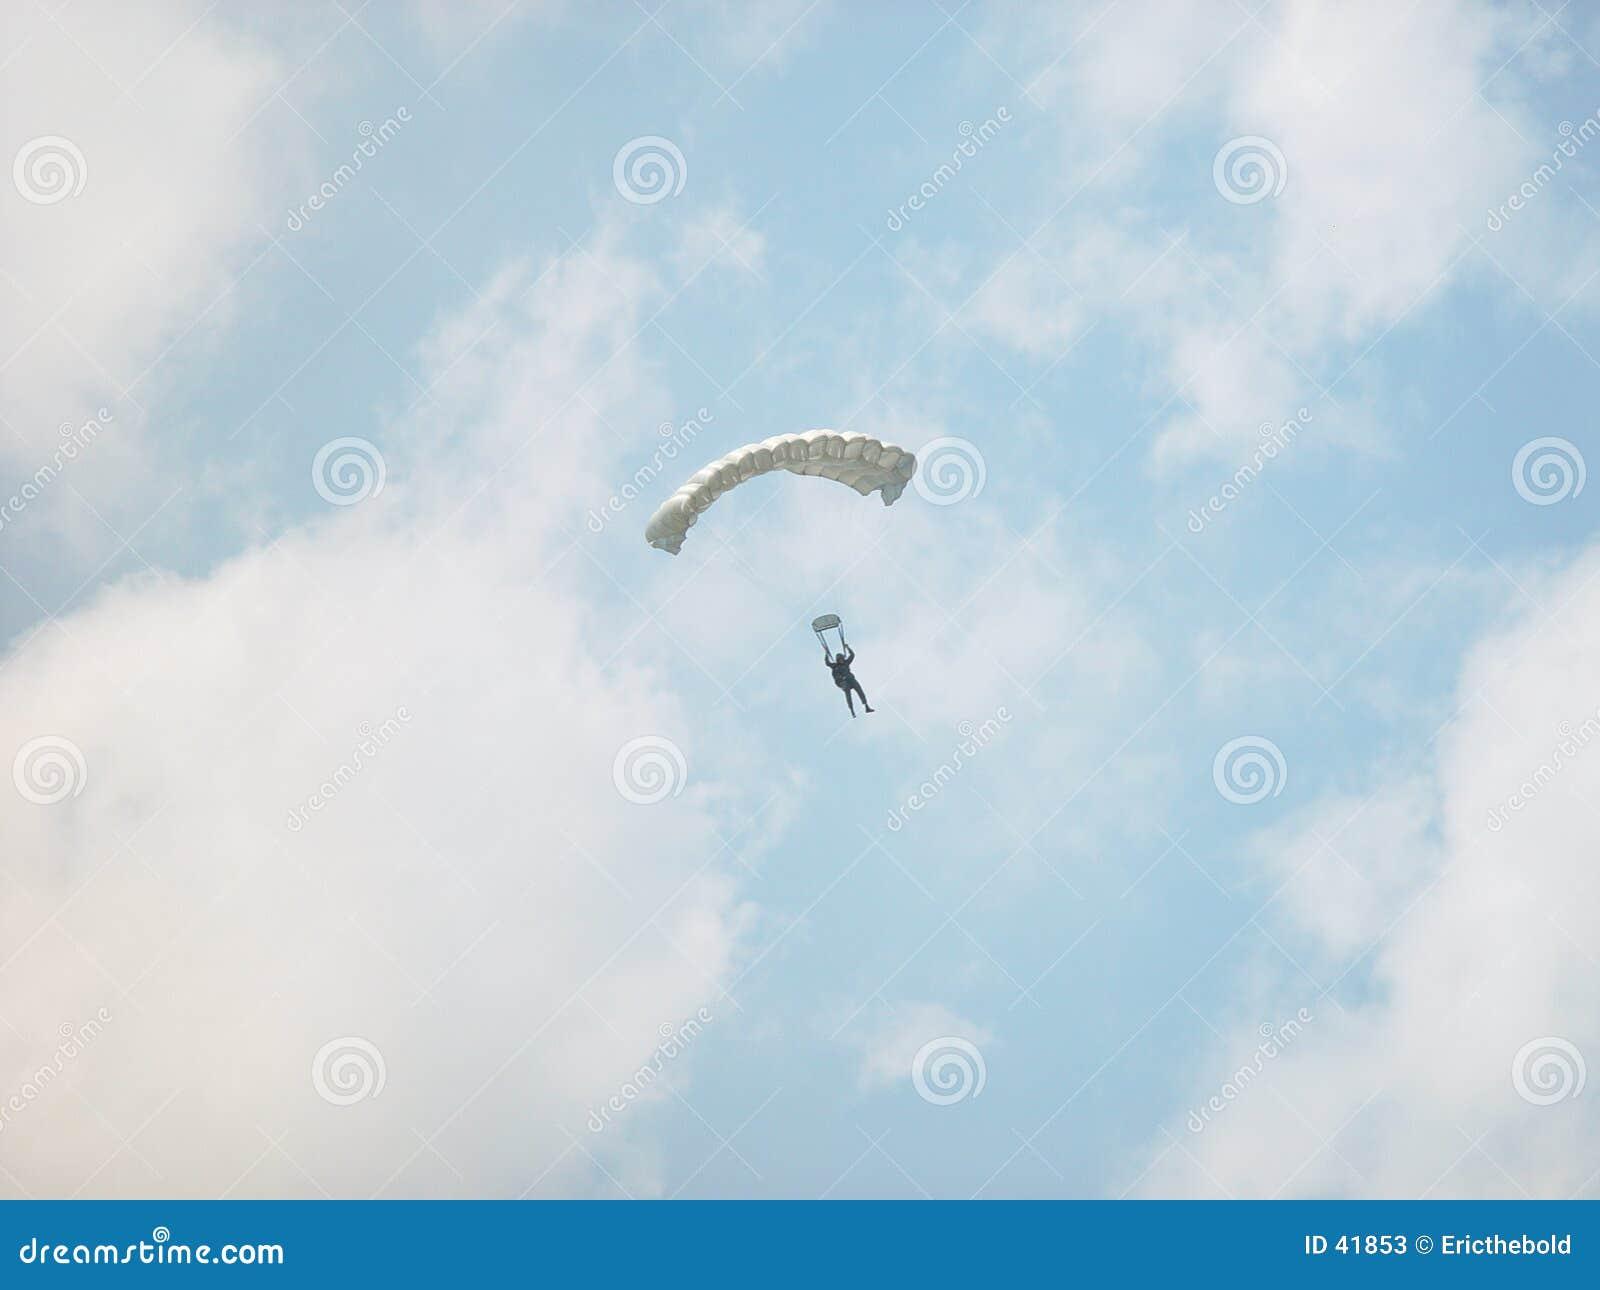 Mid-air